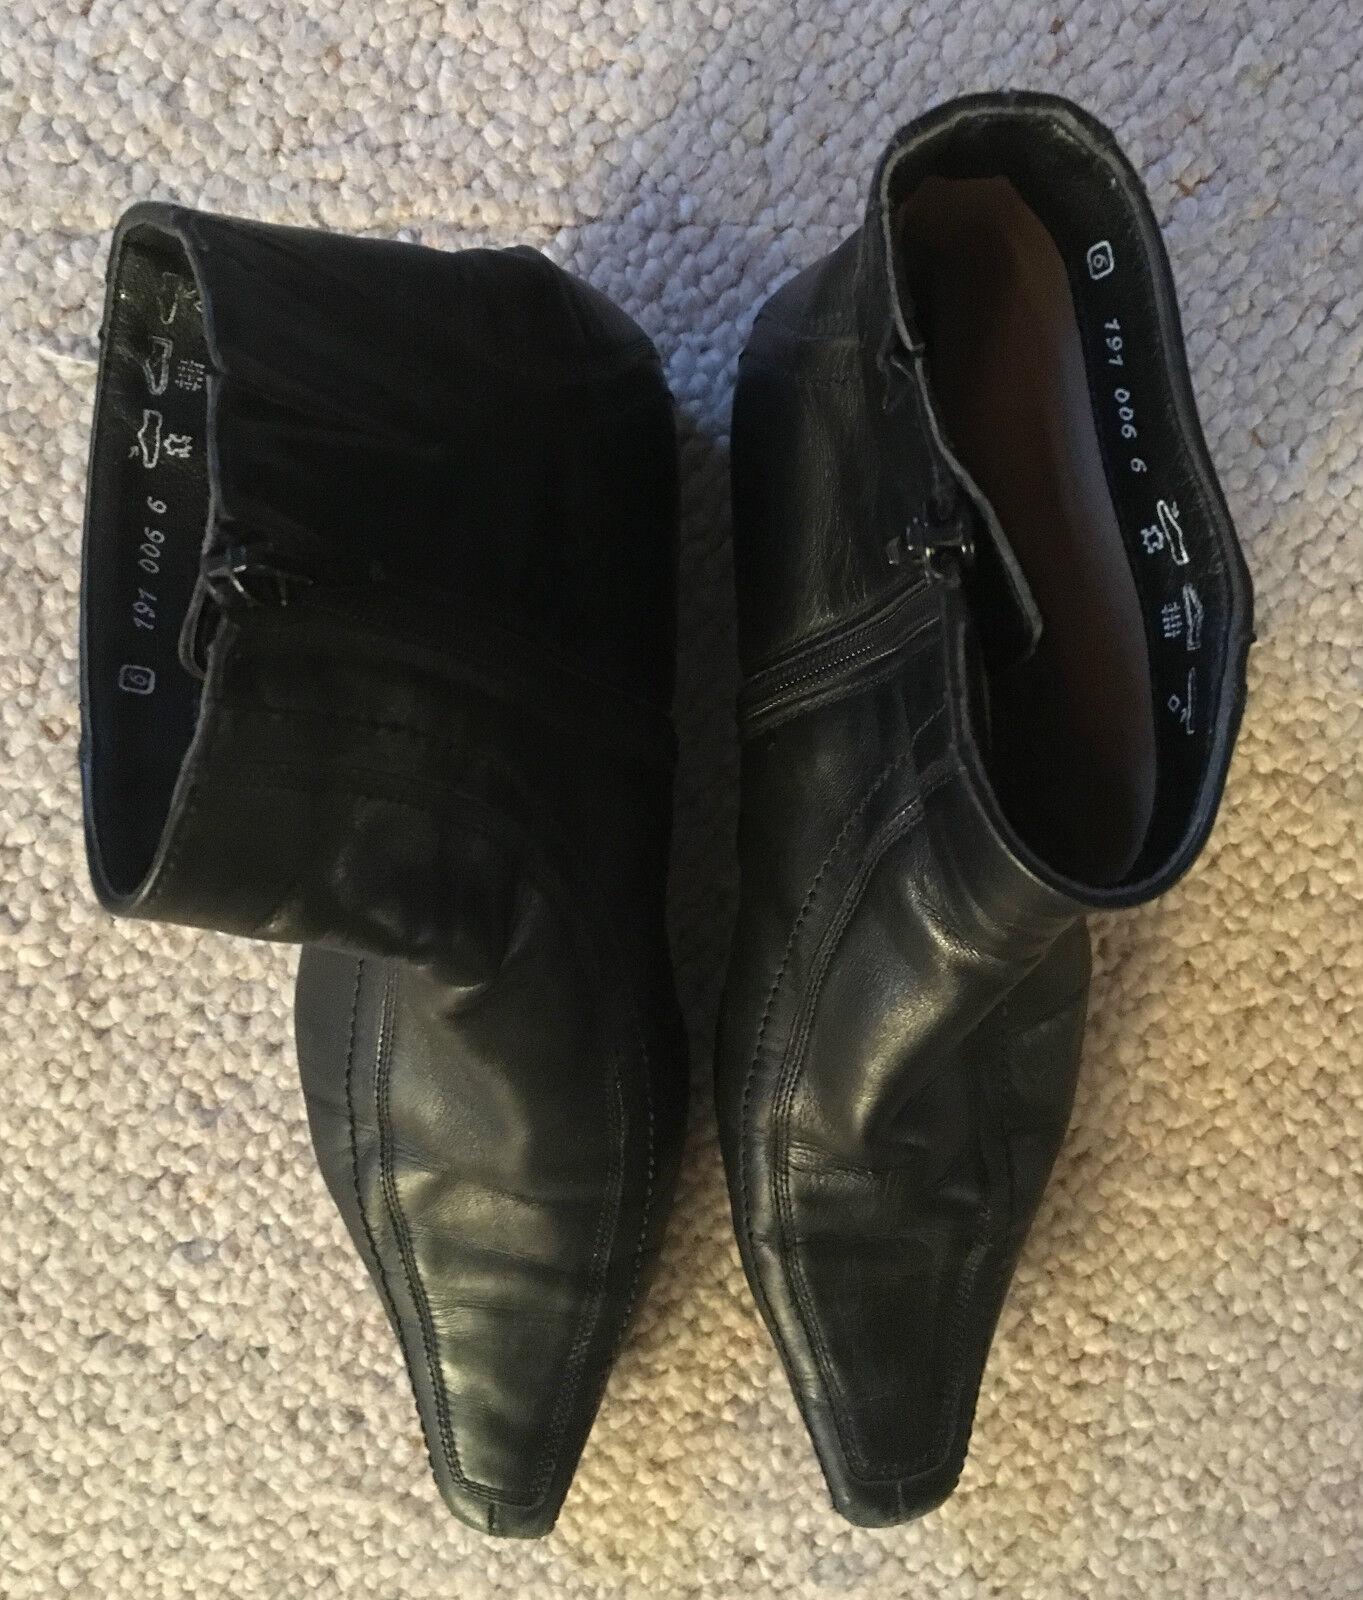 K + S Shoes Damen Schuhe Stiefel Stiefelette Glattleder schwarz Gr. 6/39